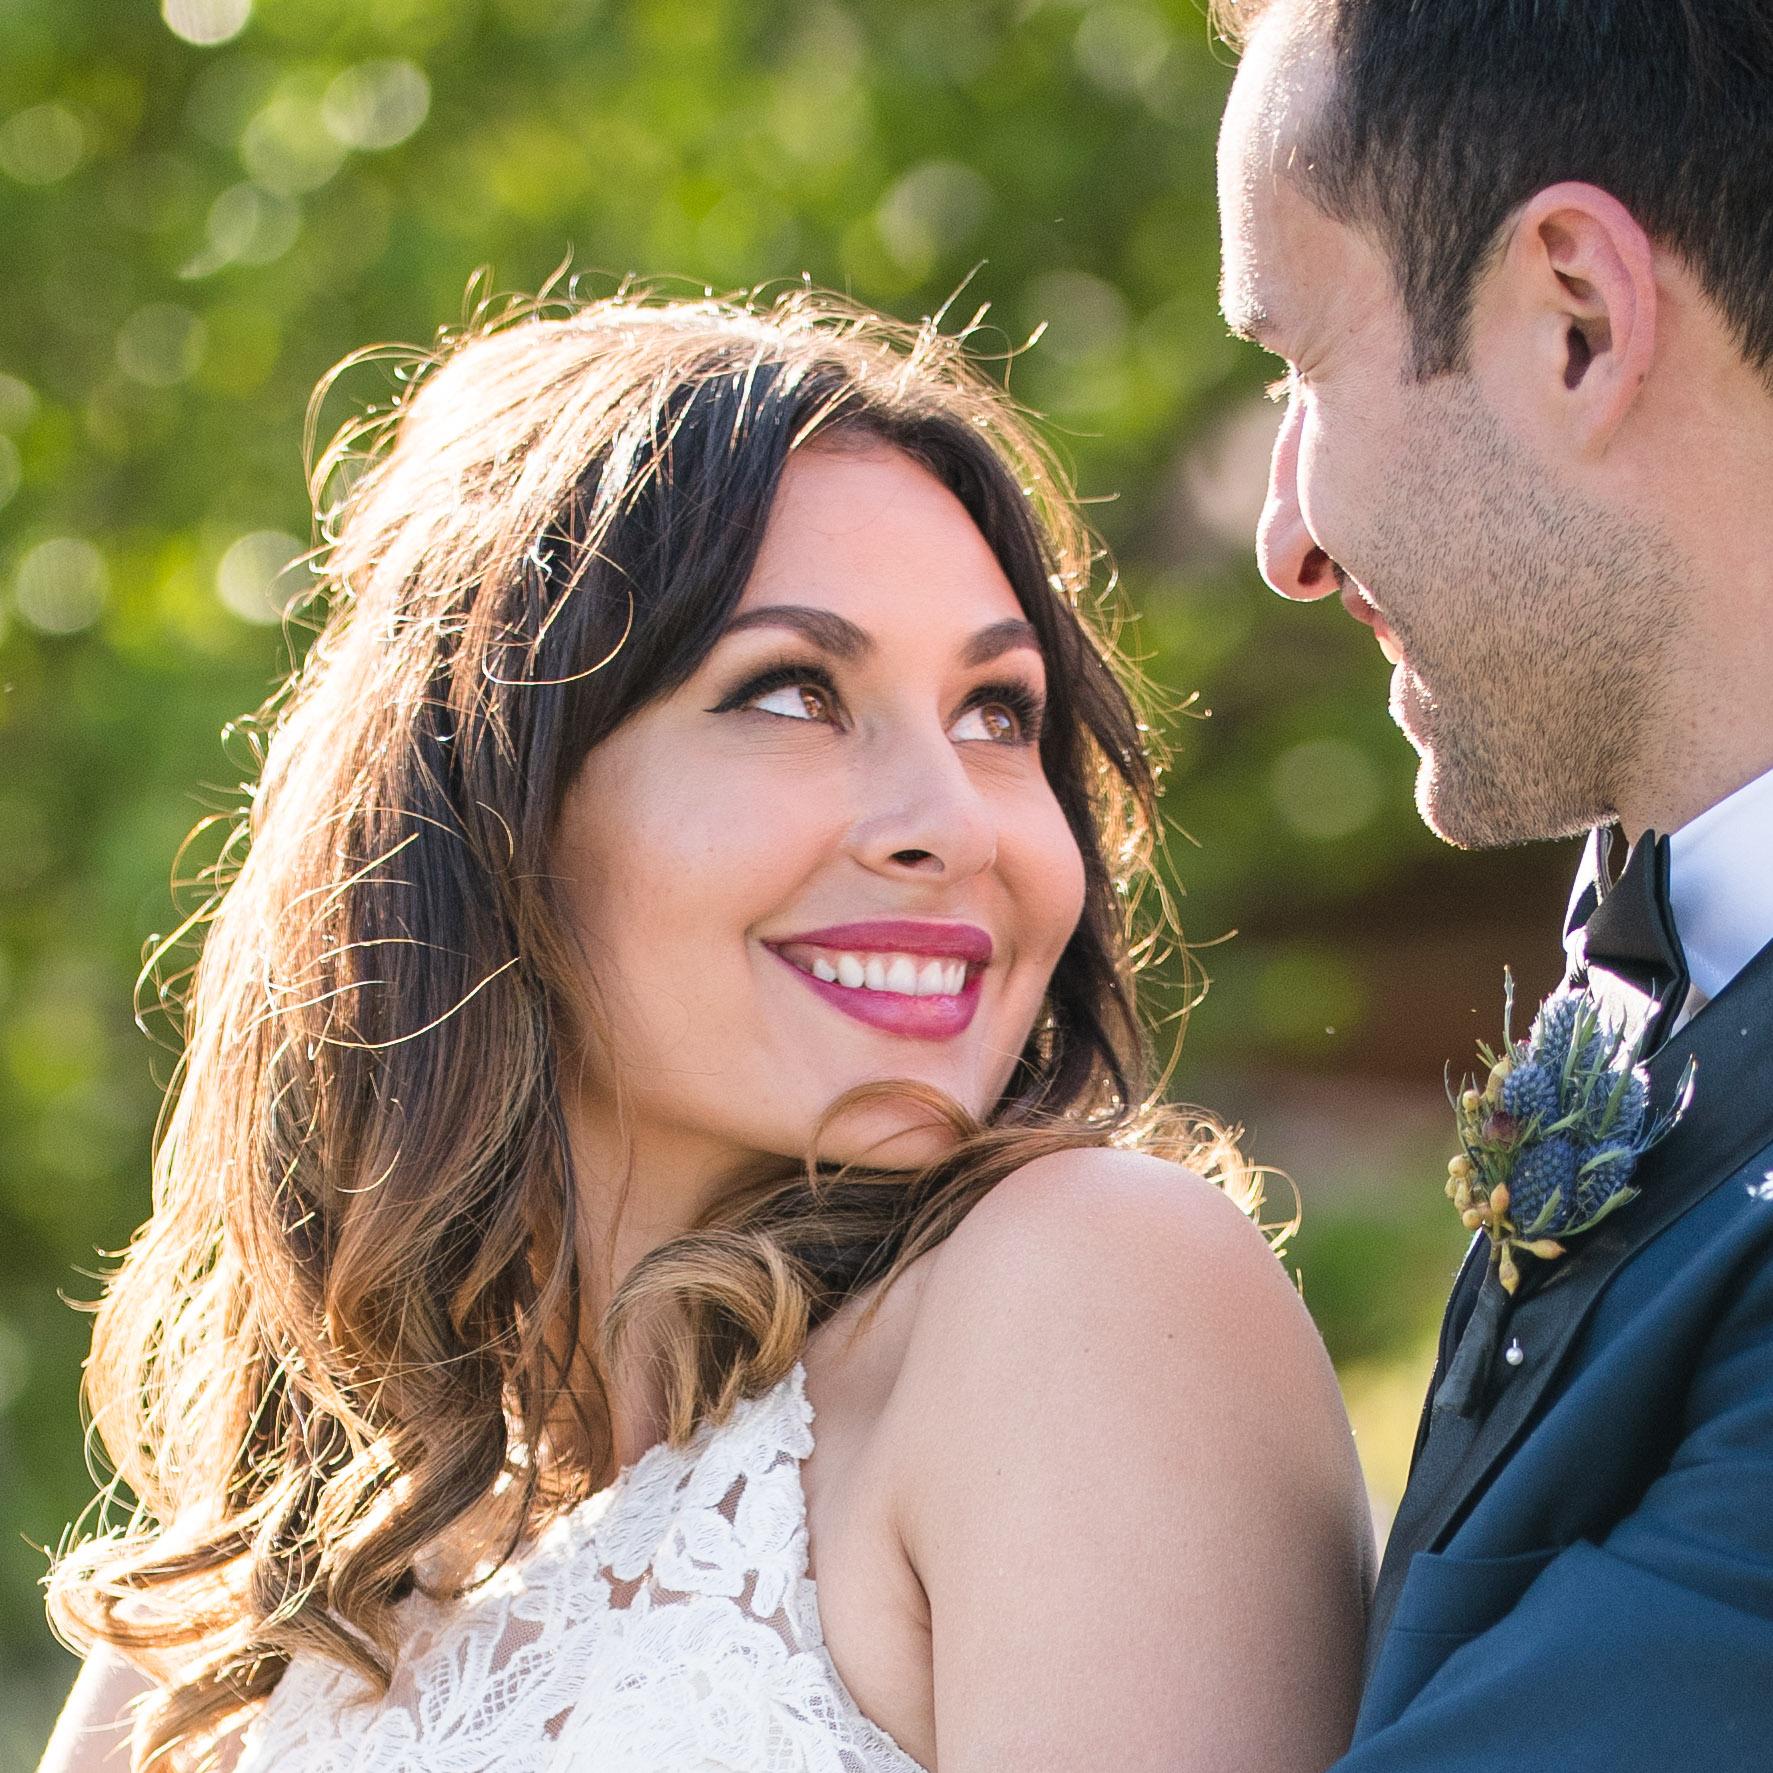 Vibrant Fiesta Backyard Wedding Reception gorgeous bride and her groom.jpg